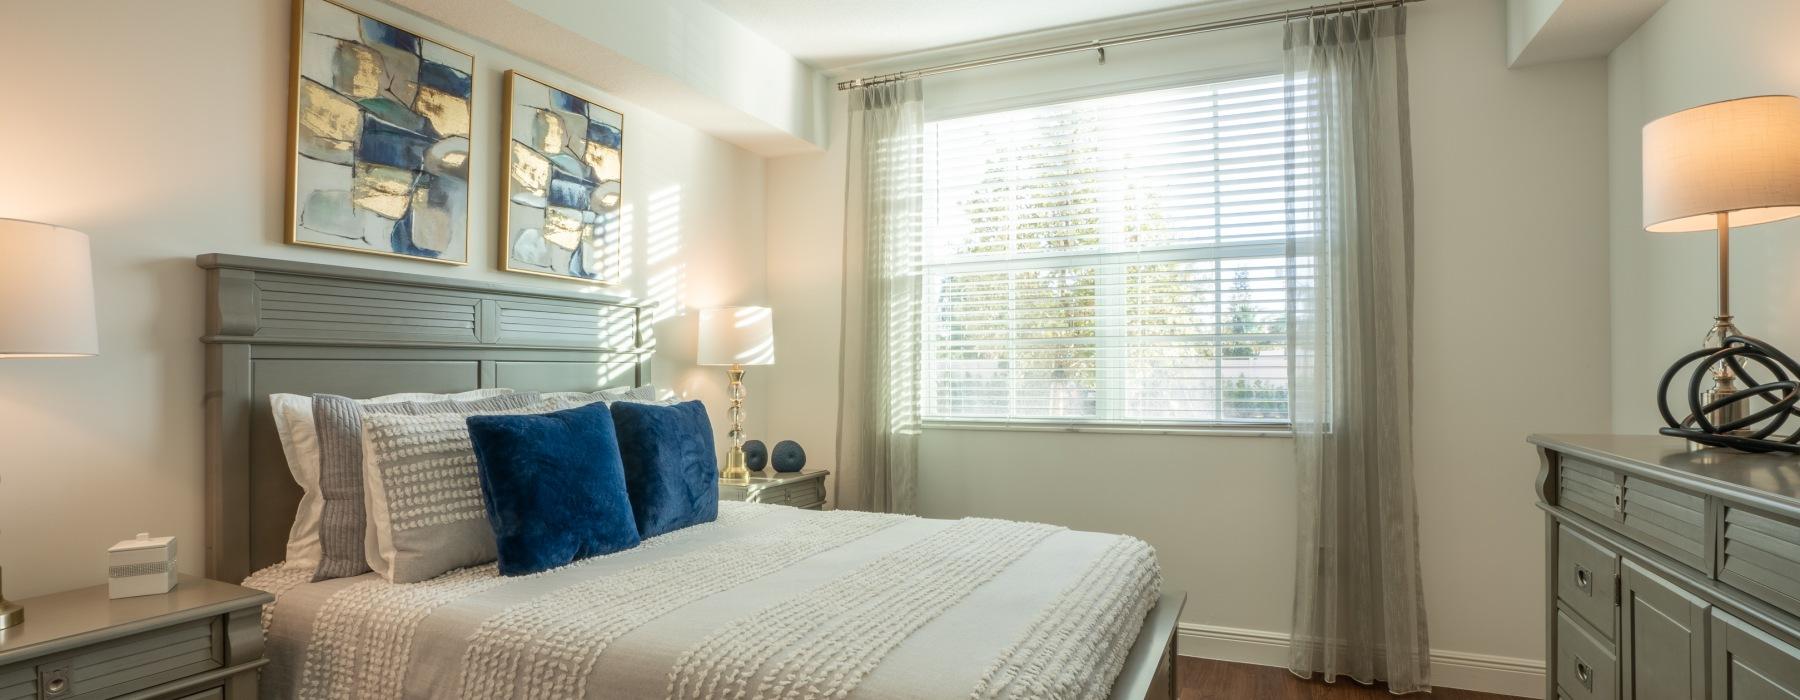 Bedroom Next to Large Window